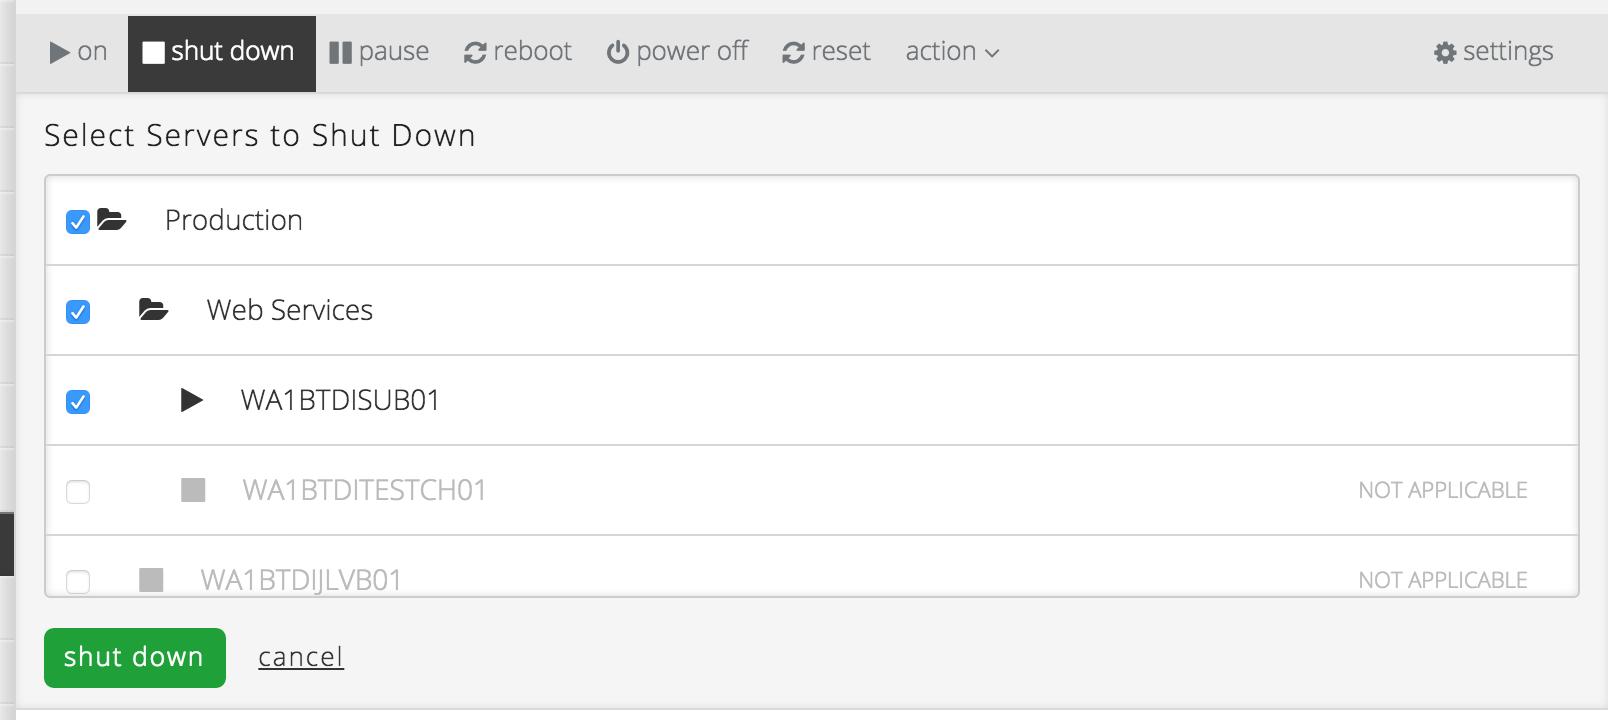 Server Power Operations in der CenturyLink Cloud